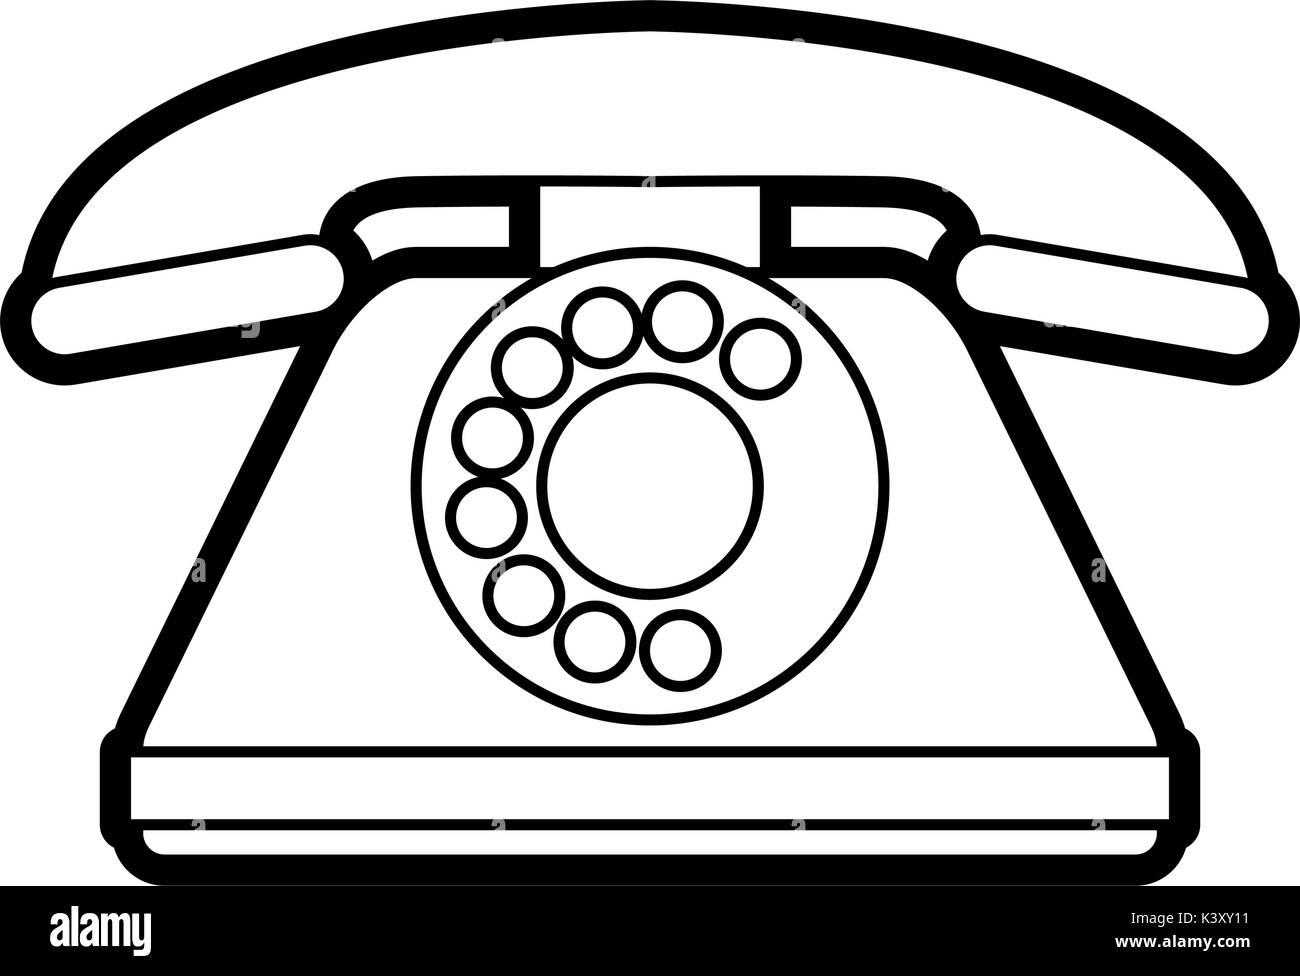 Isolated retro phone design - Stock Image